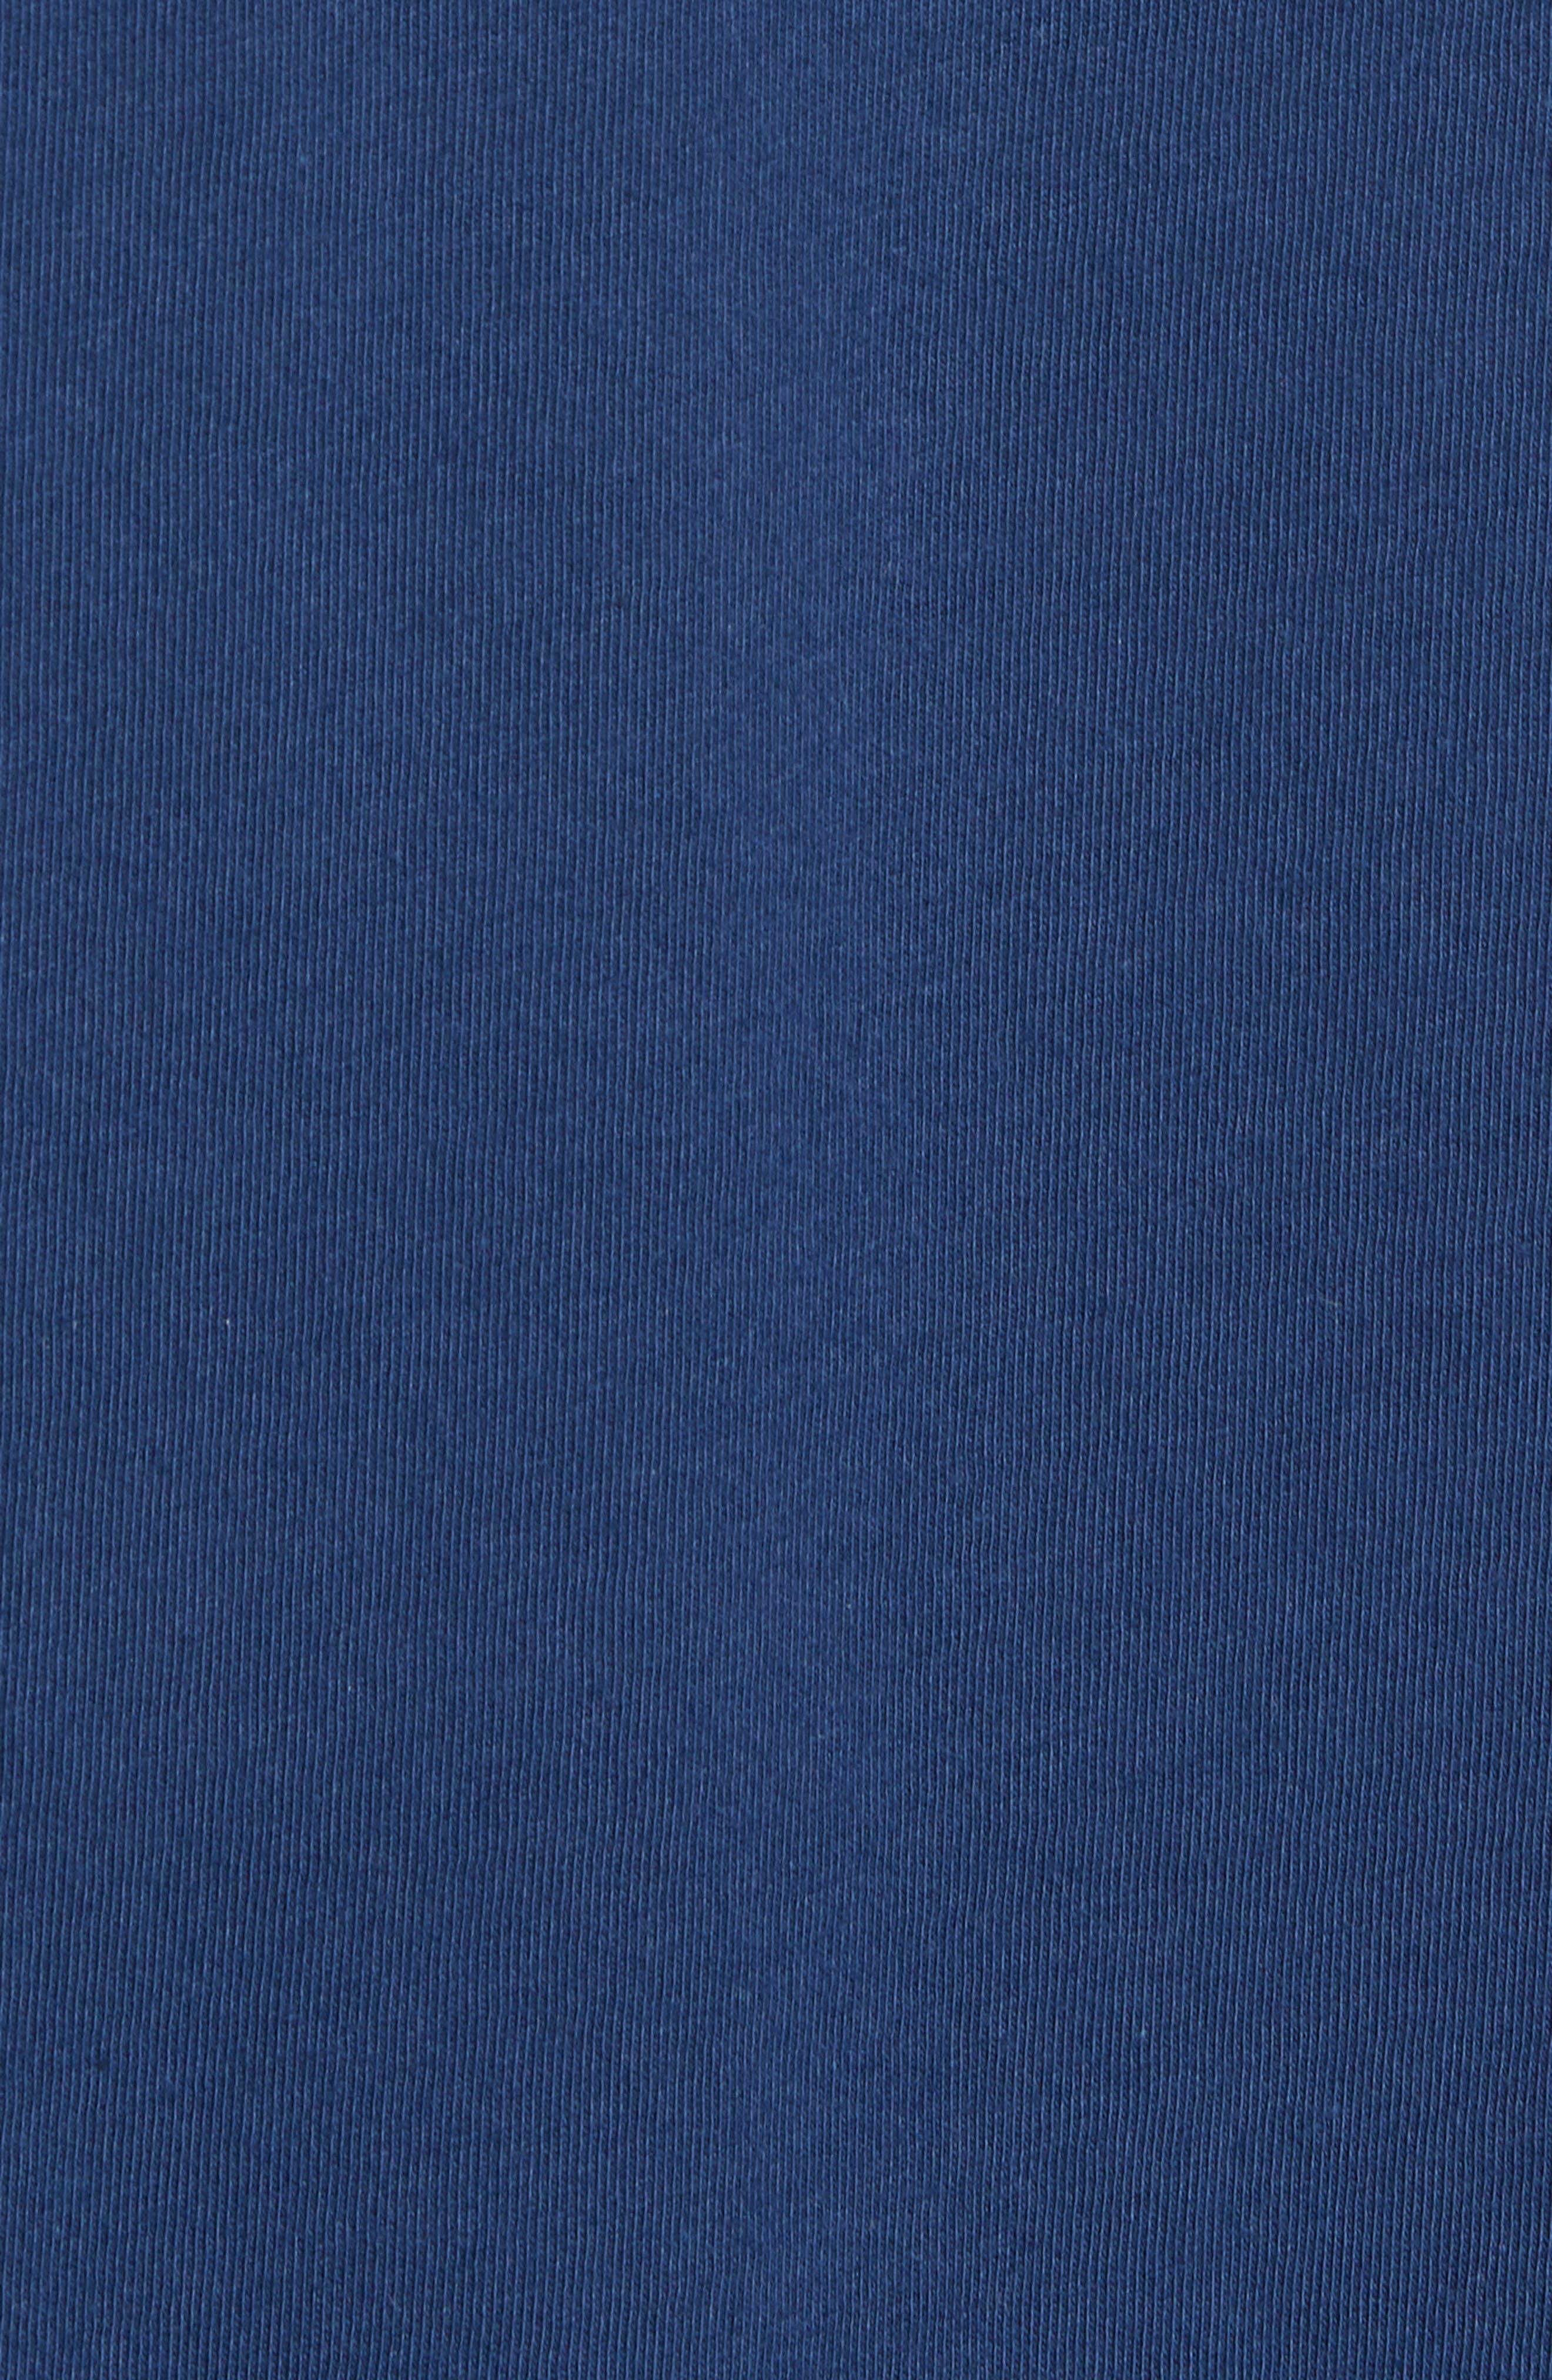 Colorblock T-Shirt,                             Alternate thumbnail 5, color,                             402